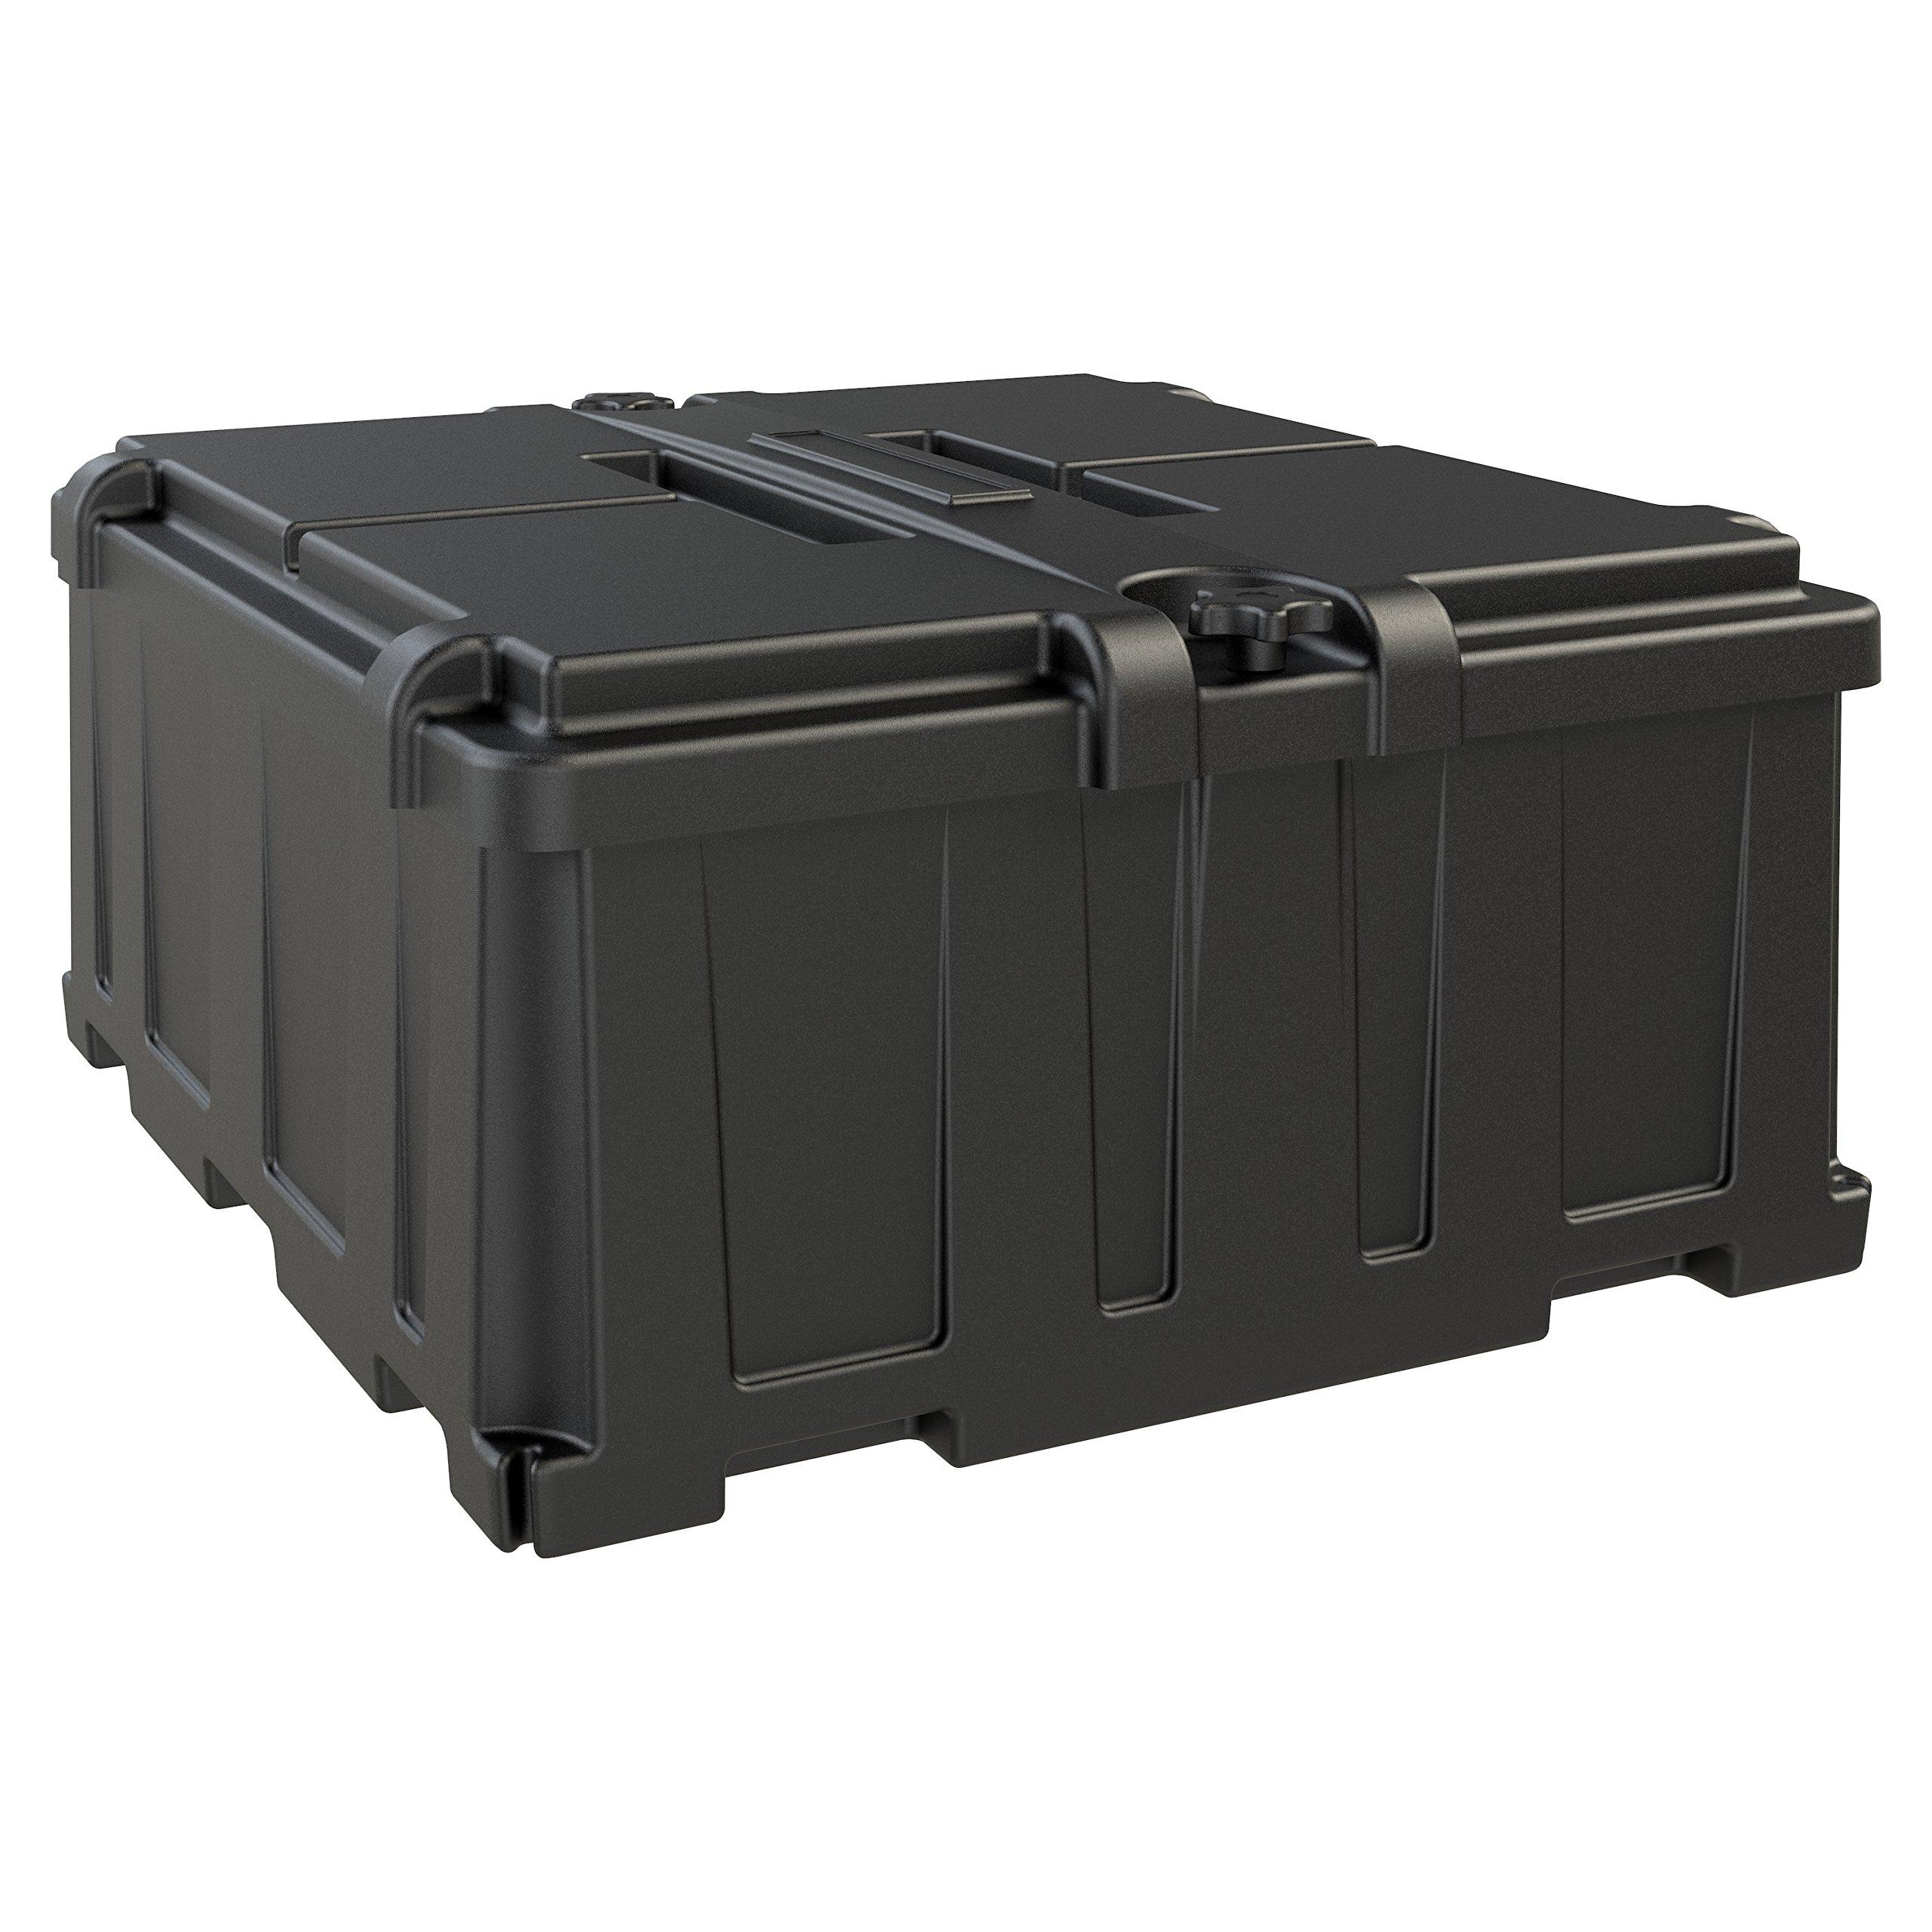 NOCO HM485 Dual 8D Commercial-Grade Battery Box